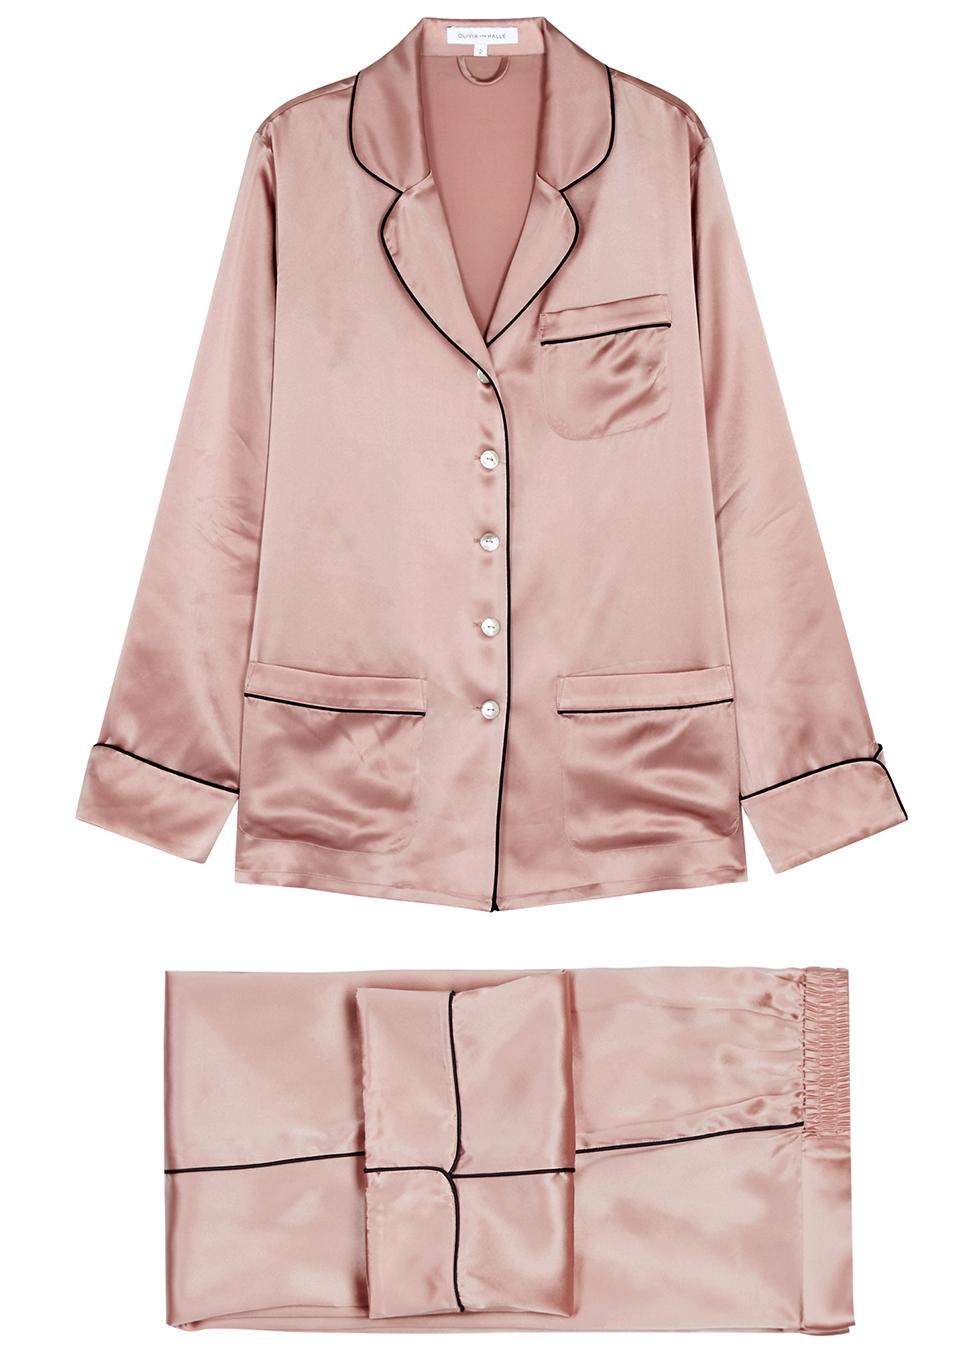 Gucci designer sleepwear lingerie